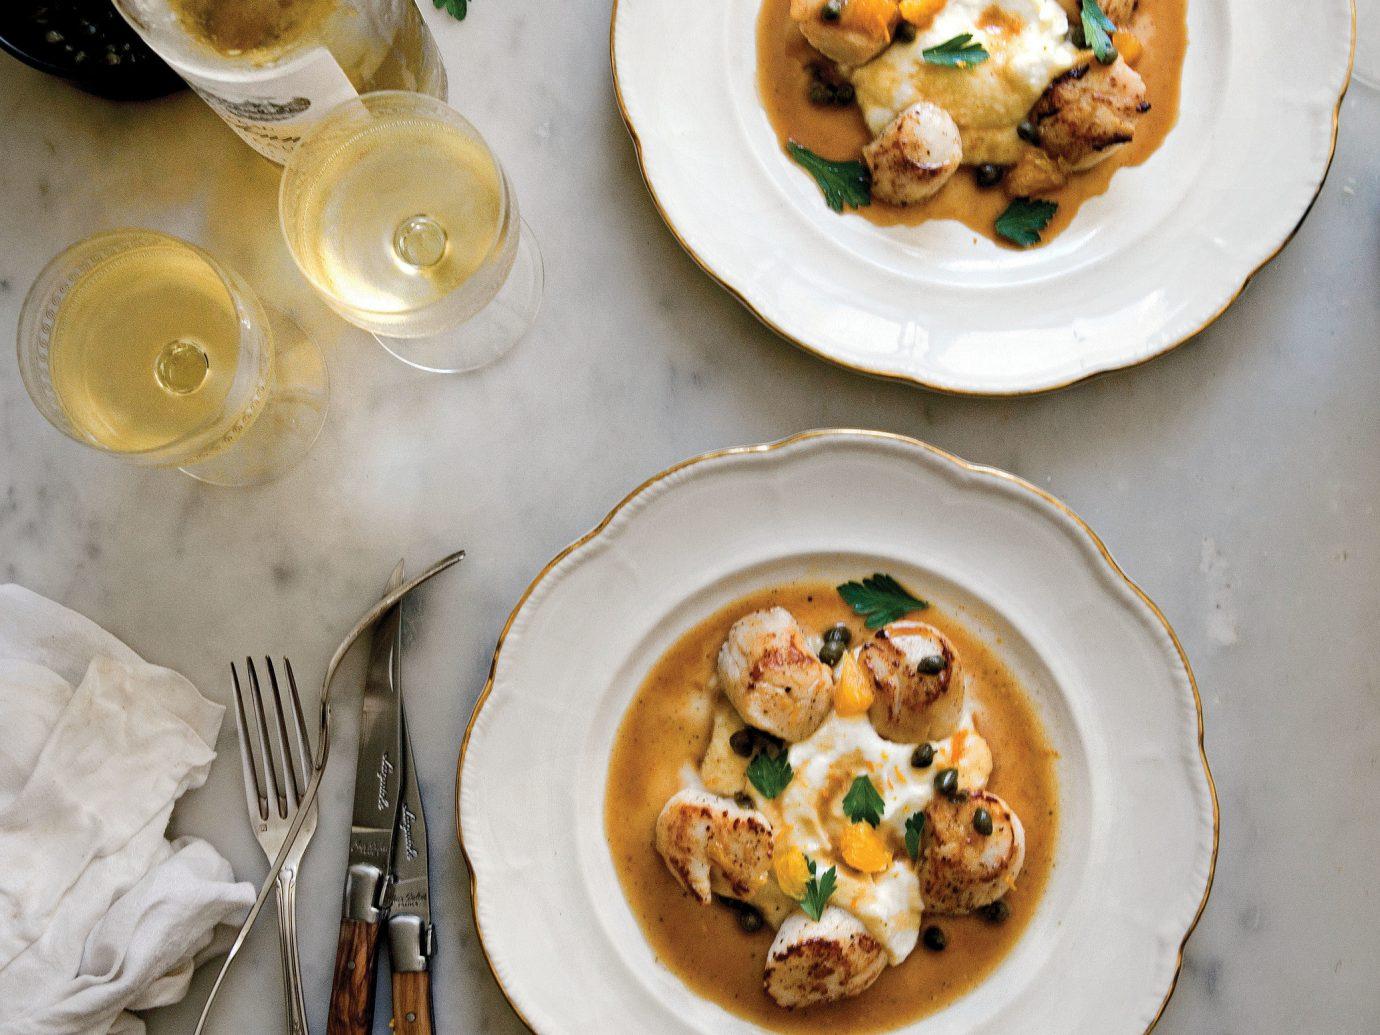 Food + Drink dish food plate meal produce breakfast vegetable cuisine brunch